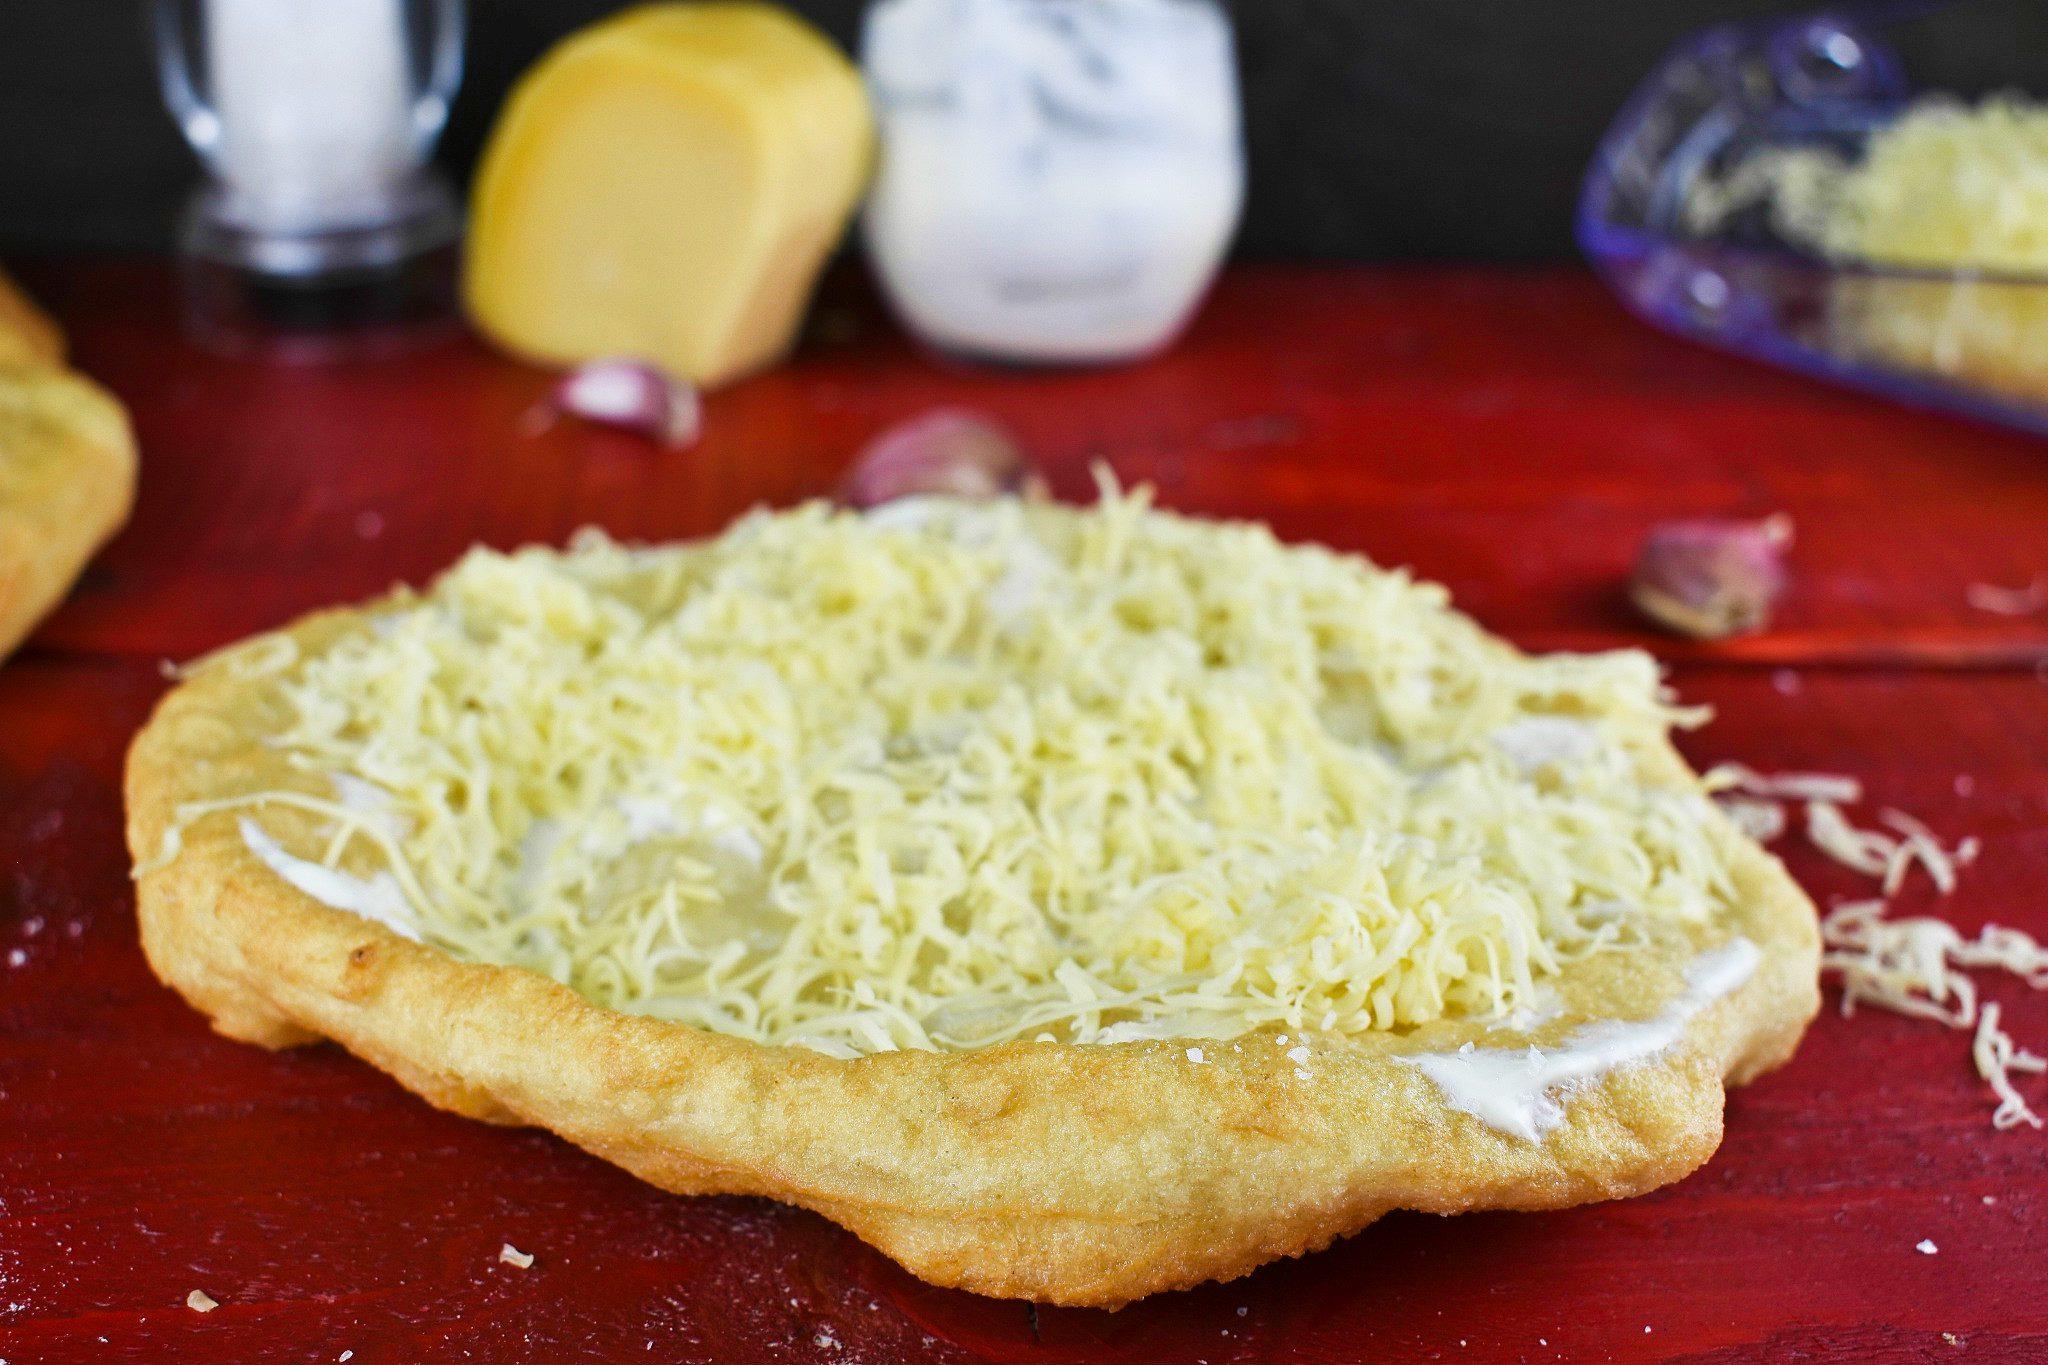 Fried-bread-recipe-the-hungarian-langos-2-SunCakeMom